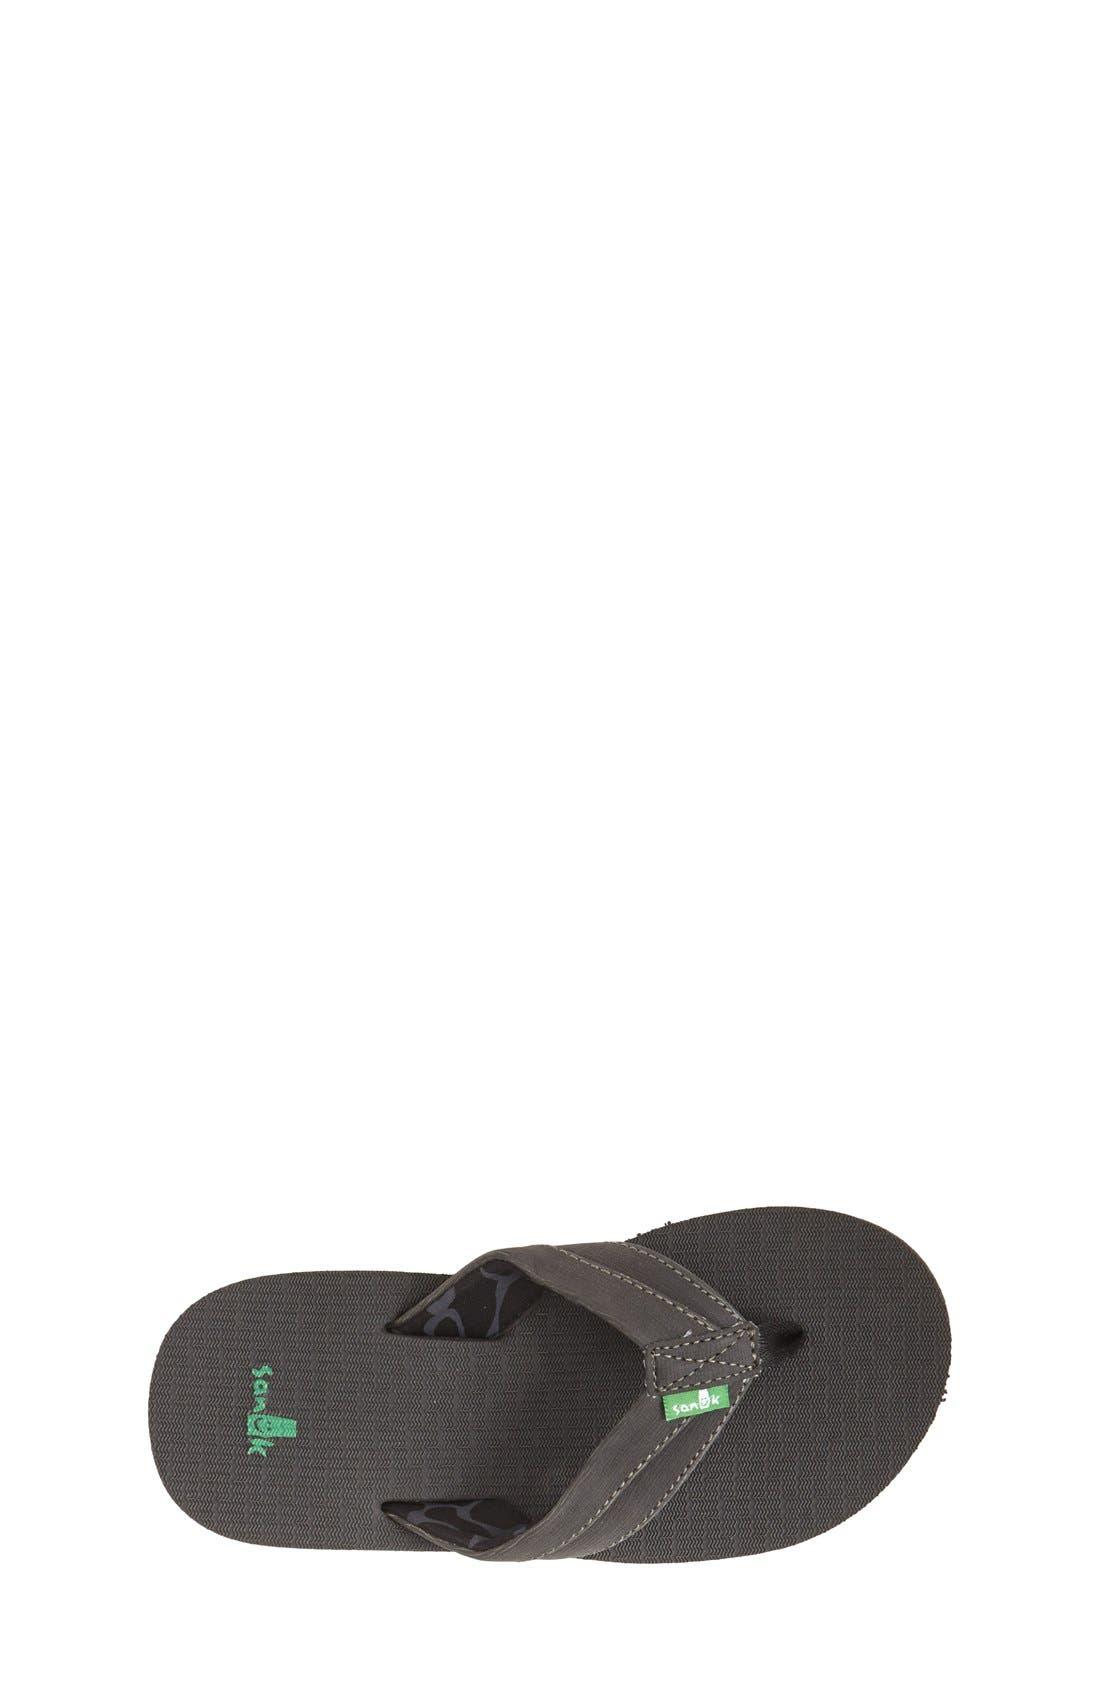 'Rootbeer Cozy' Lightweight Flip Flop Sandal,                             Alternate thumbnail 3, color,                             001